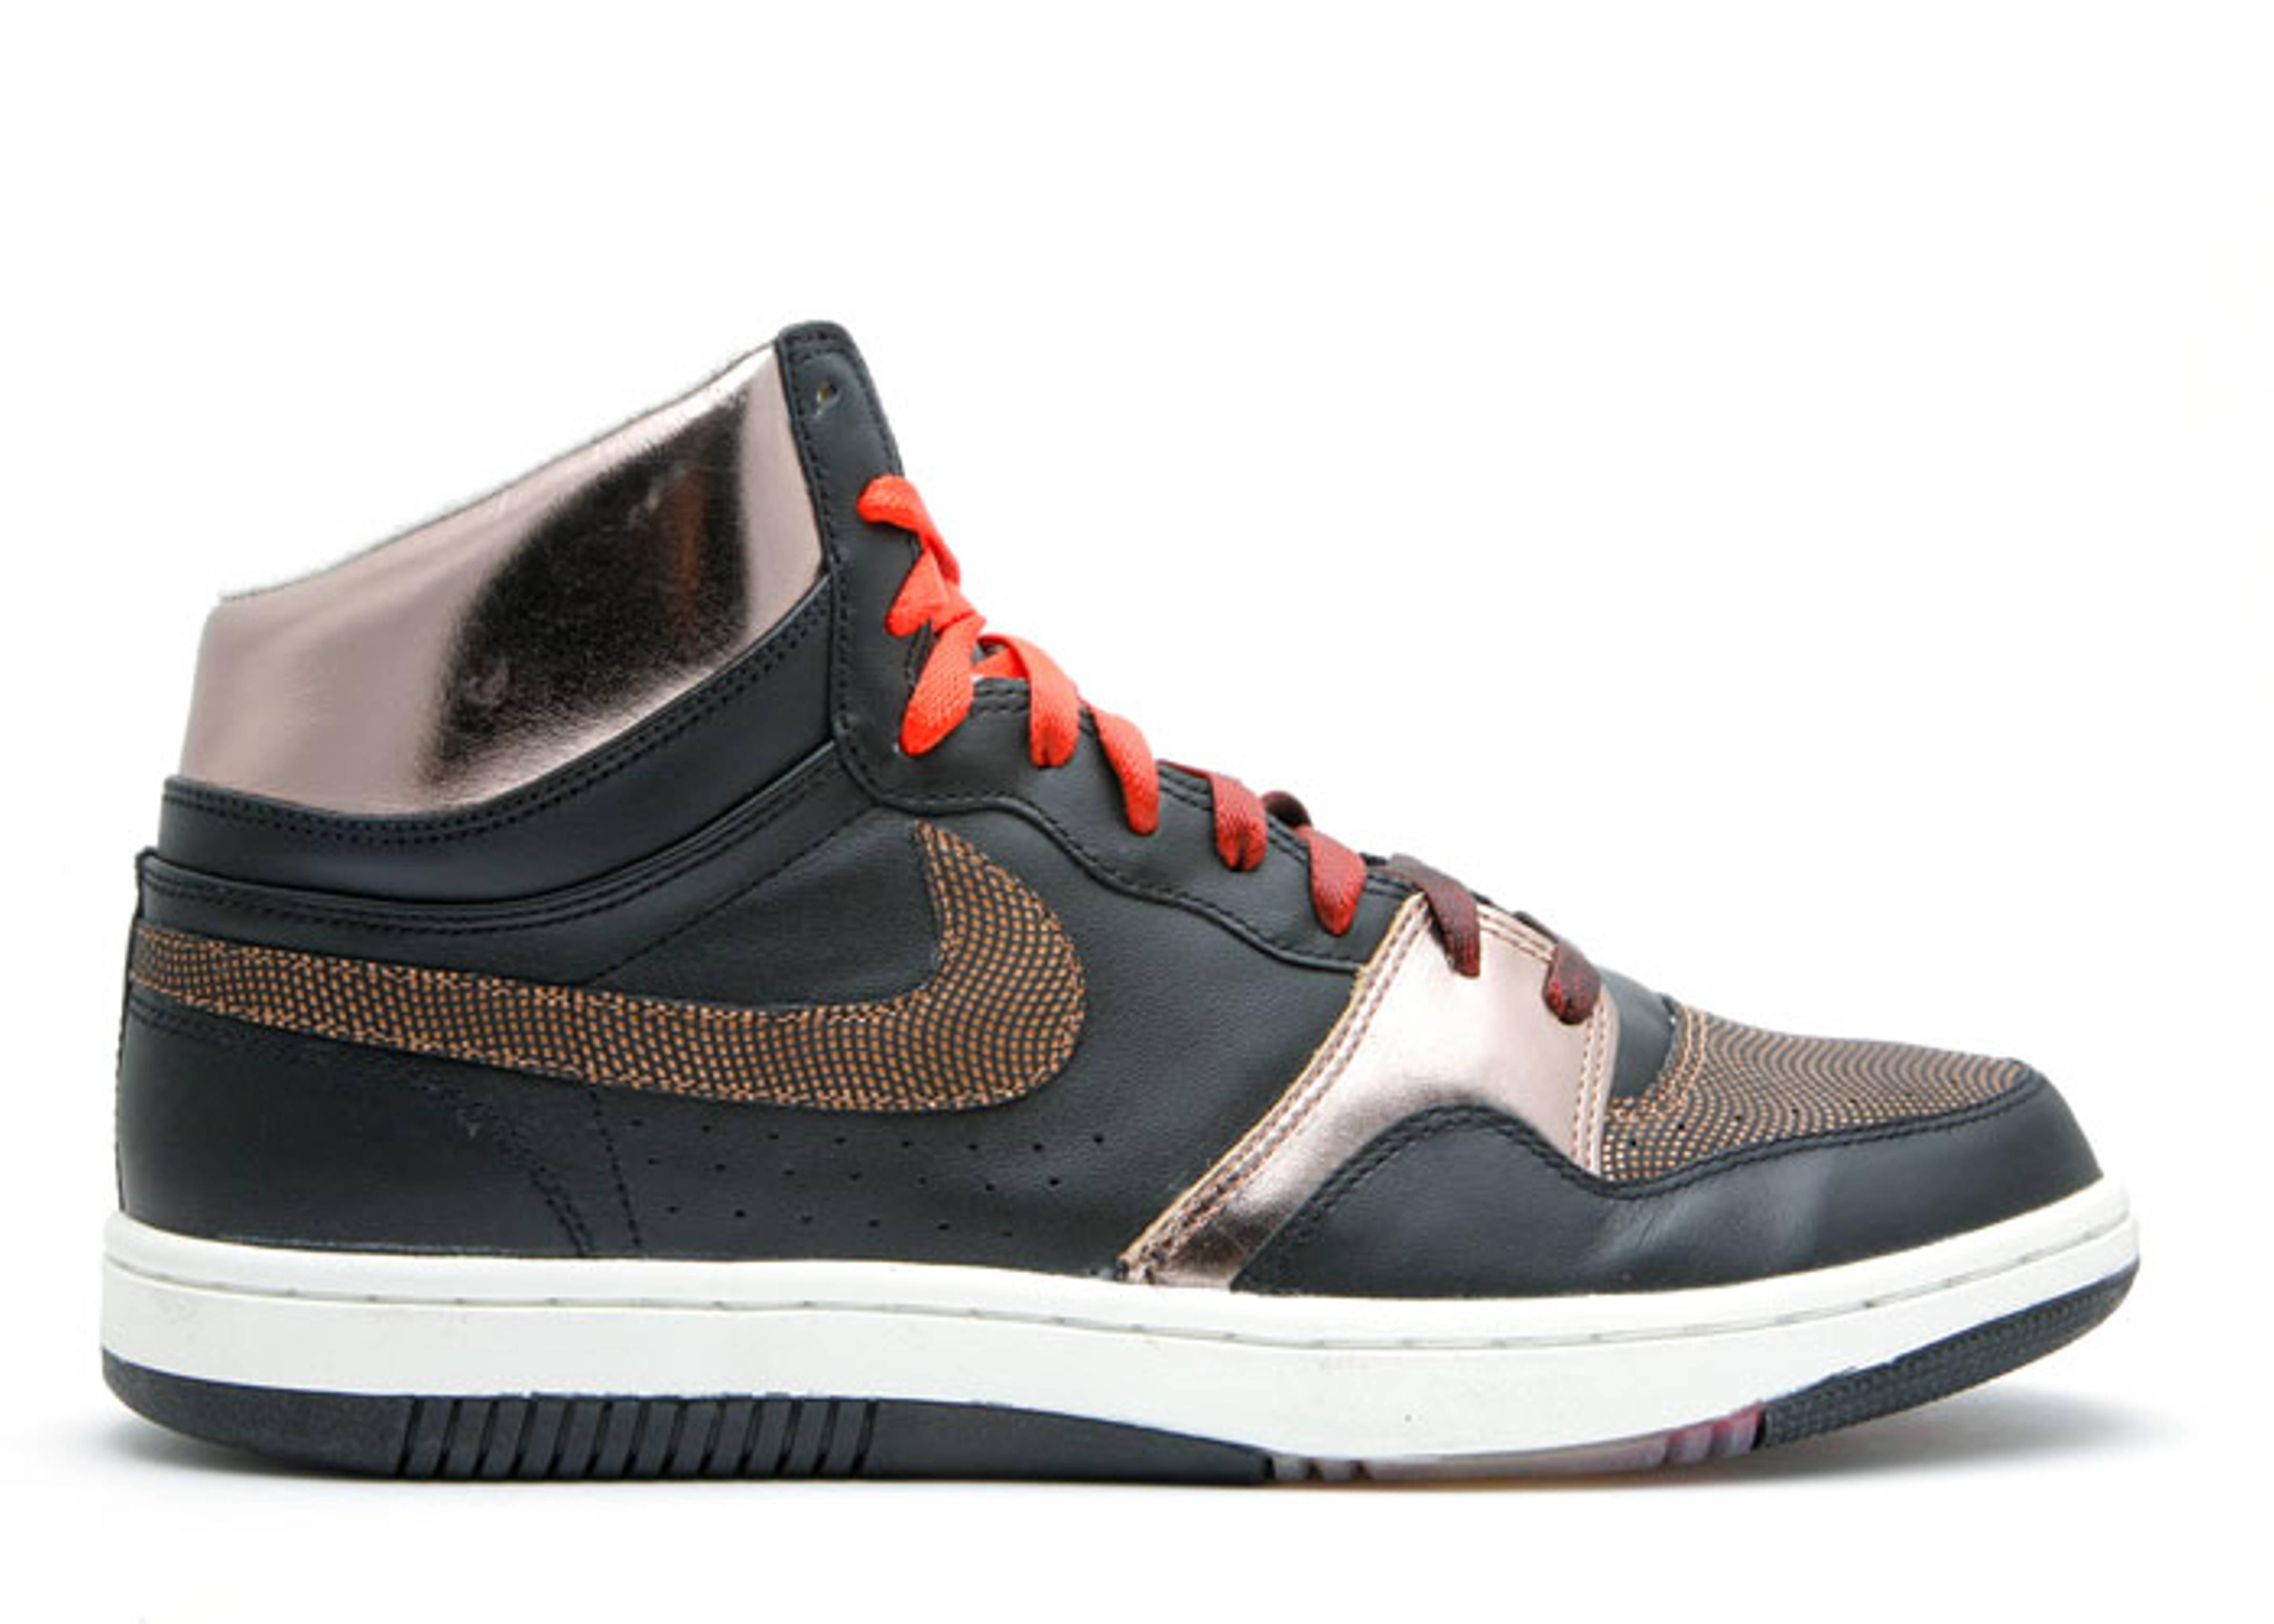 990779da1677 Court Force High - Nike - 314431 081 - black metallic copper-white-team red